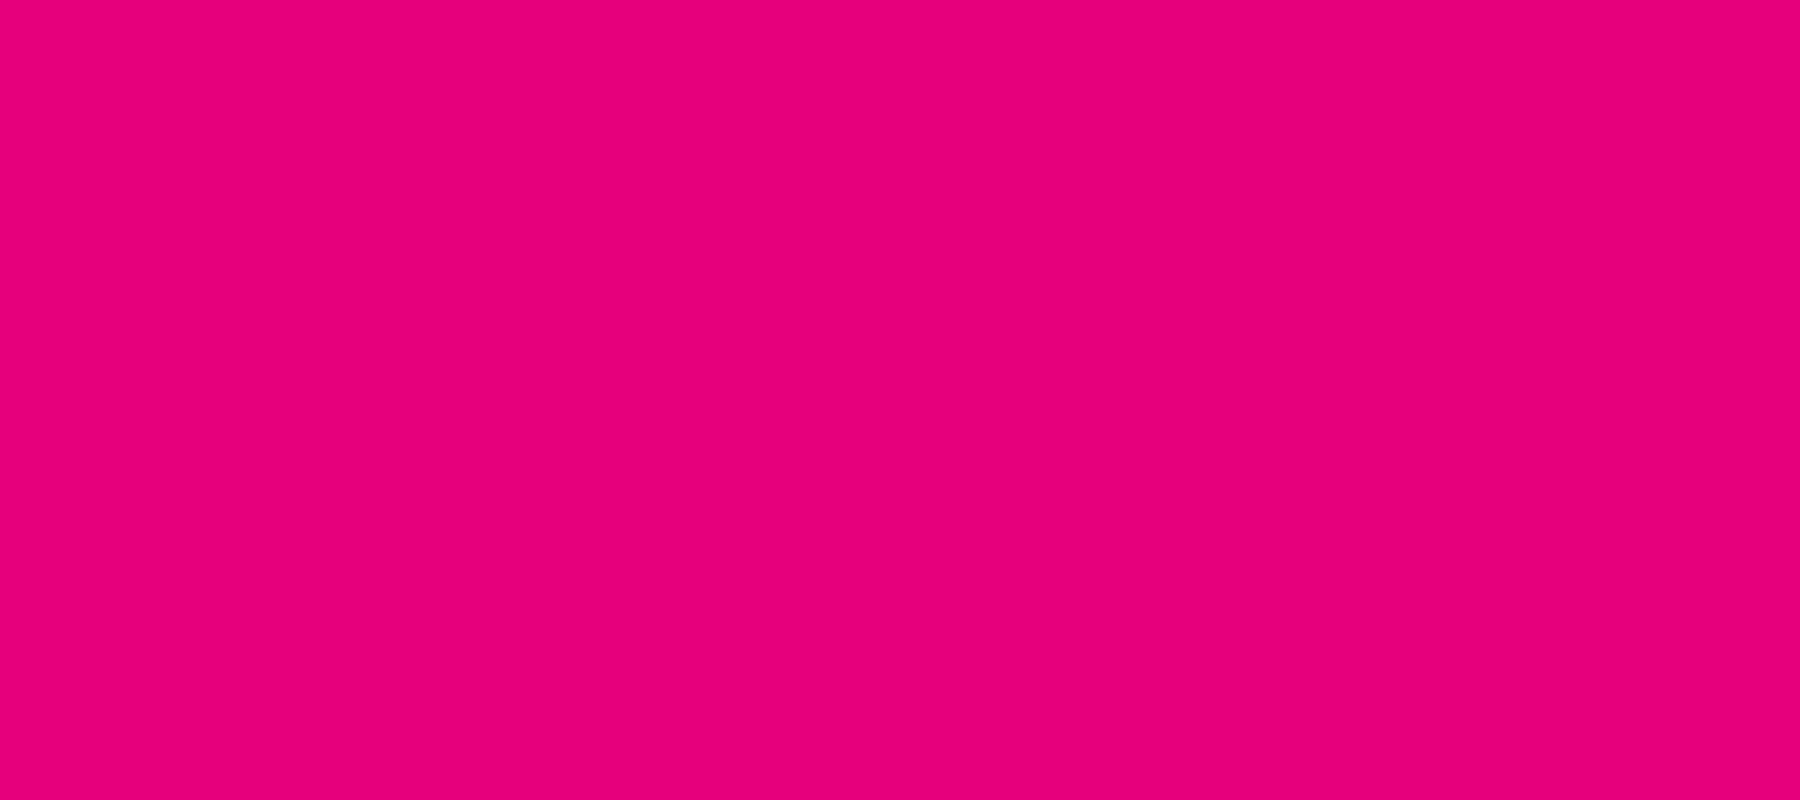 HEXA-Page-Slide4-fondrose